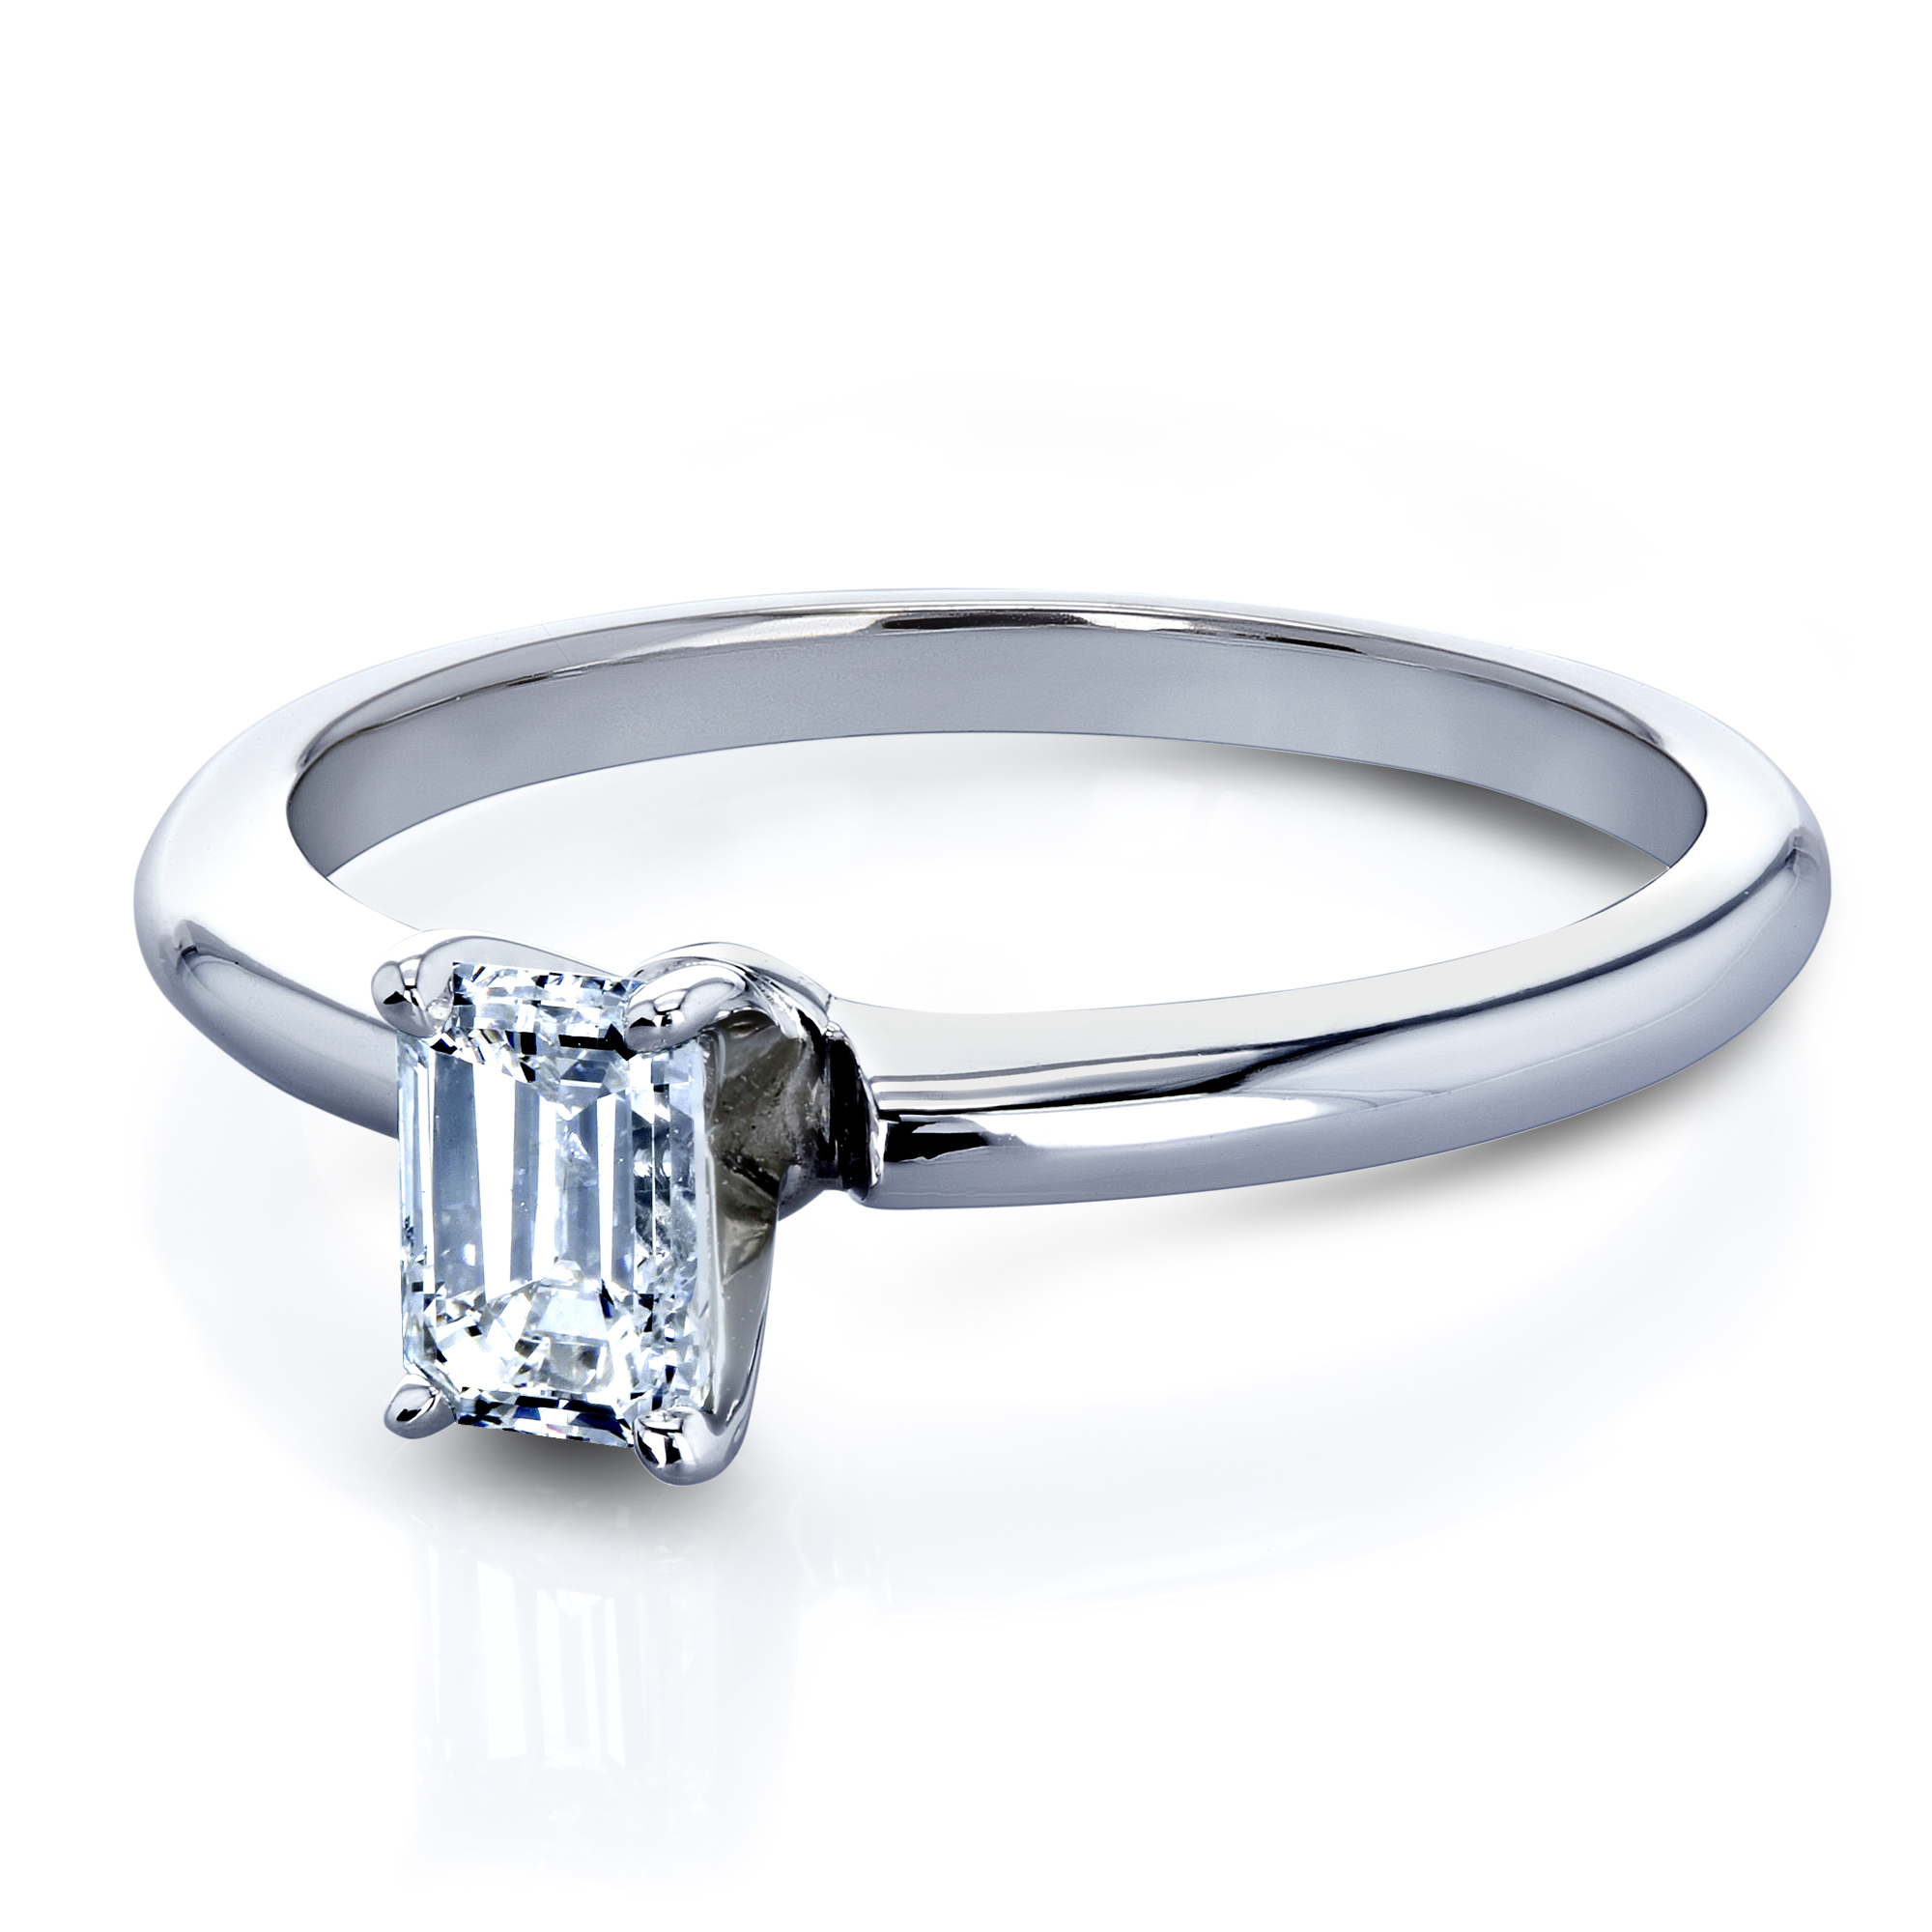 Solitaire Emerald Cut 1 2 Carat Diamond Engagement Ring In 14k White Gold 11 0 Kobelli Buy At Truefacet